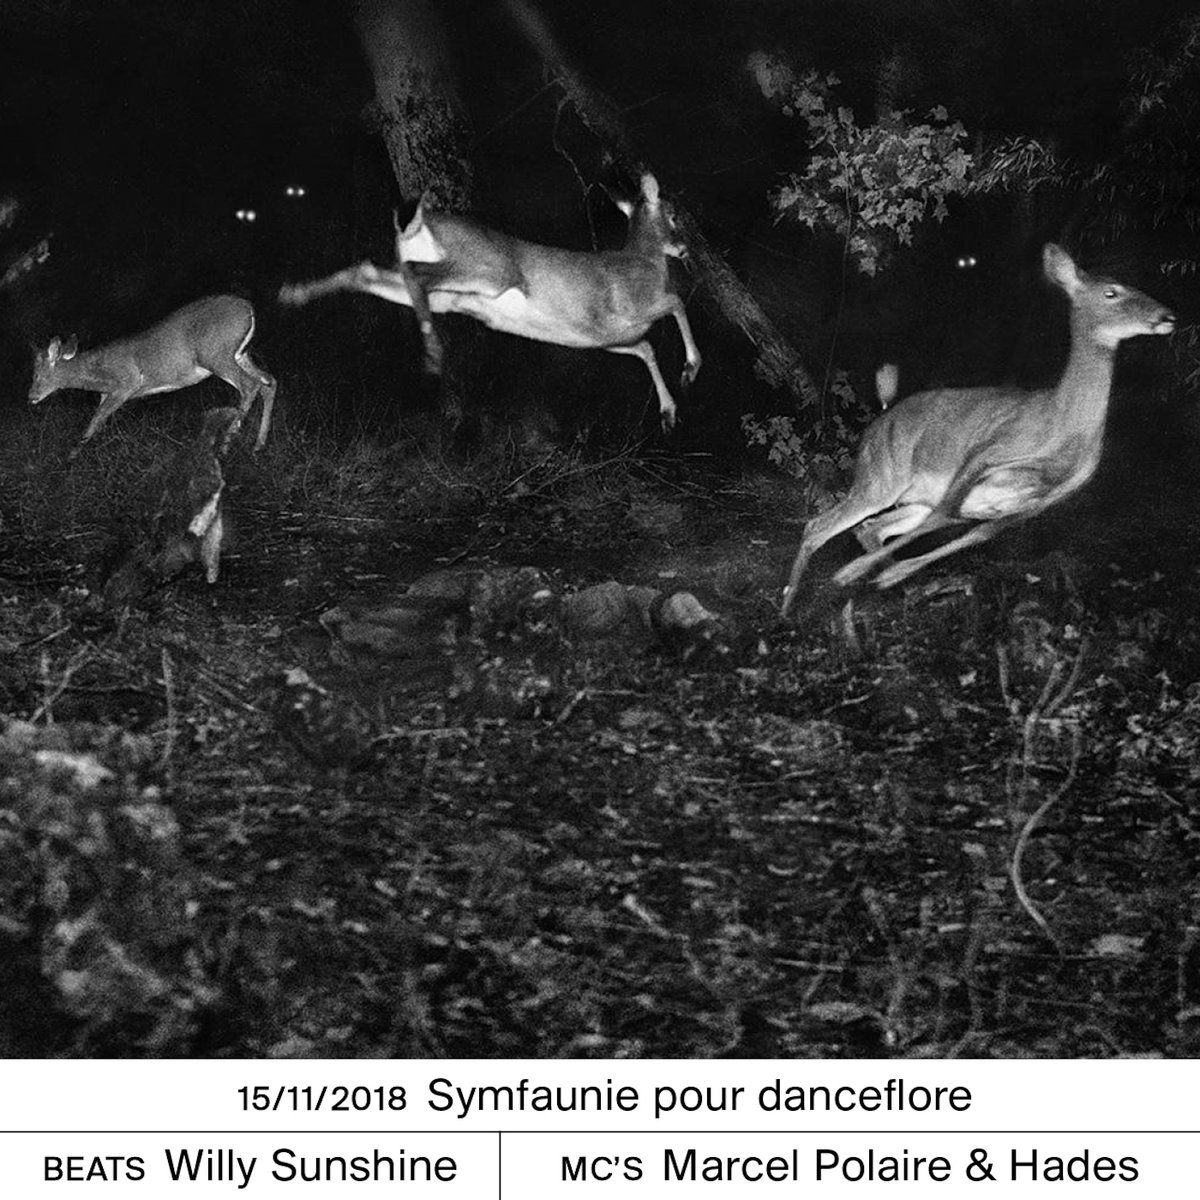 MARCEL POLAIRE & HADES – Symfaunie pourdanceflore